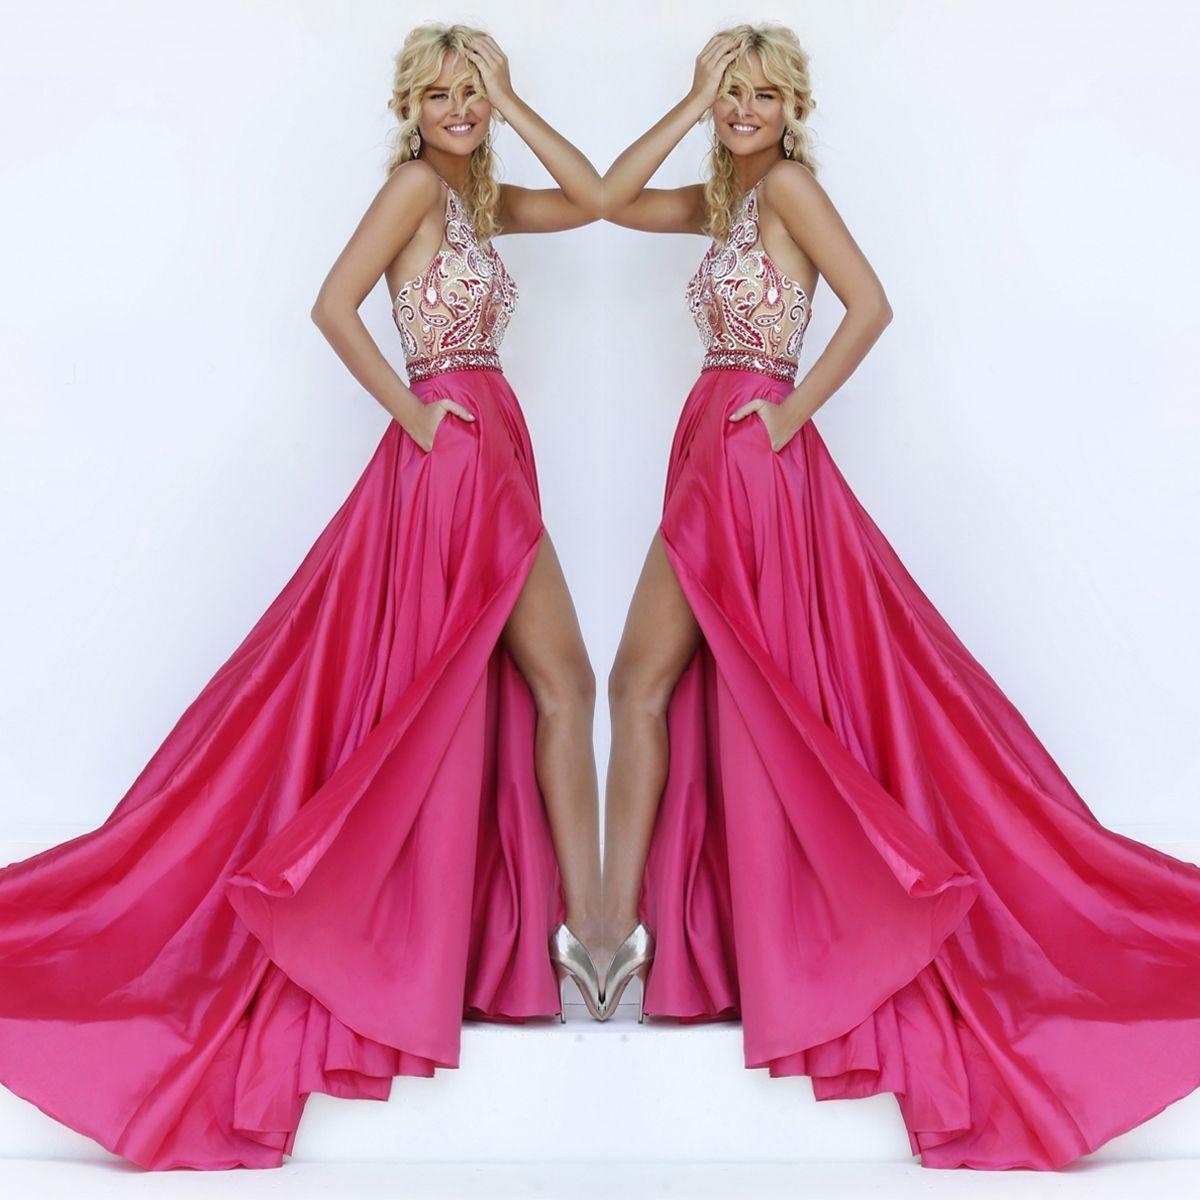 Paisley Beaded Illusion Halter Long Prom Dress by Sherri Hill ...